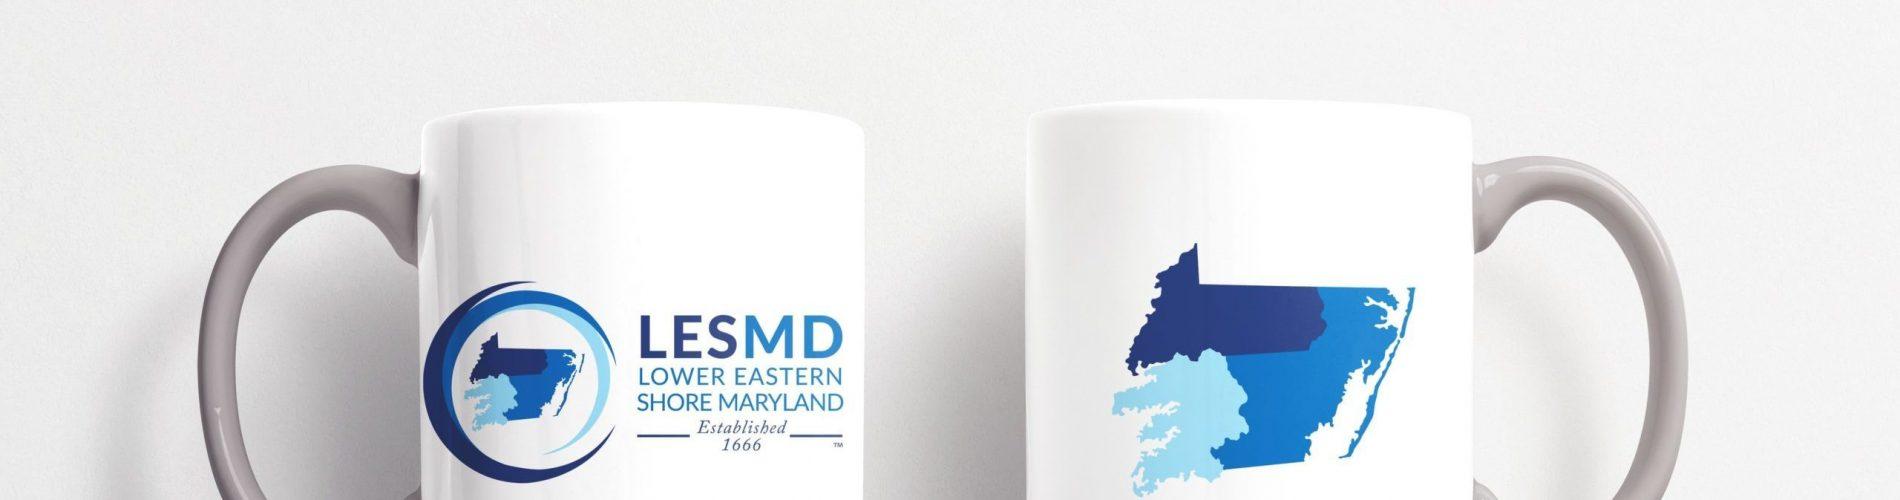 Mug Mock Up with LESMD logo on the front